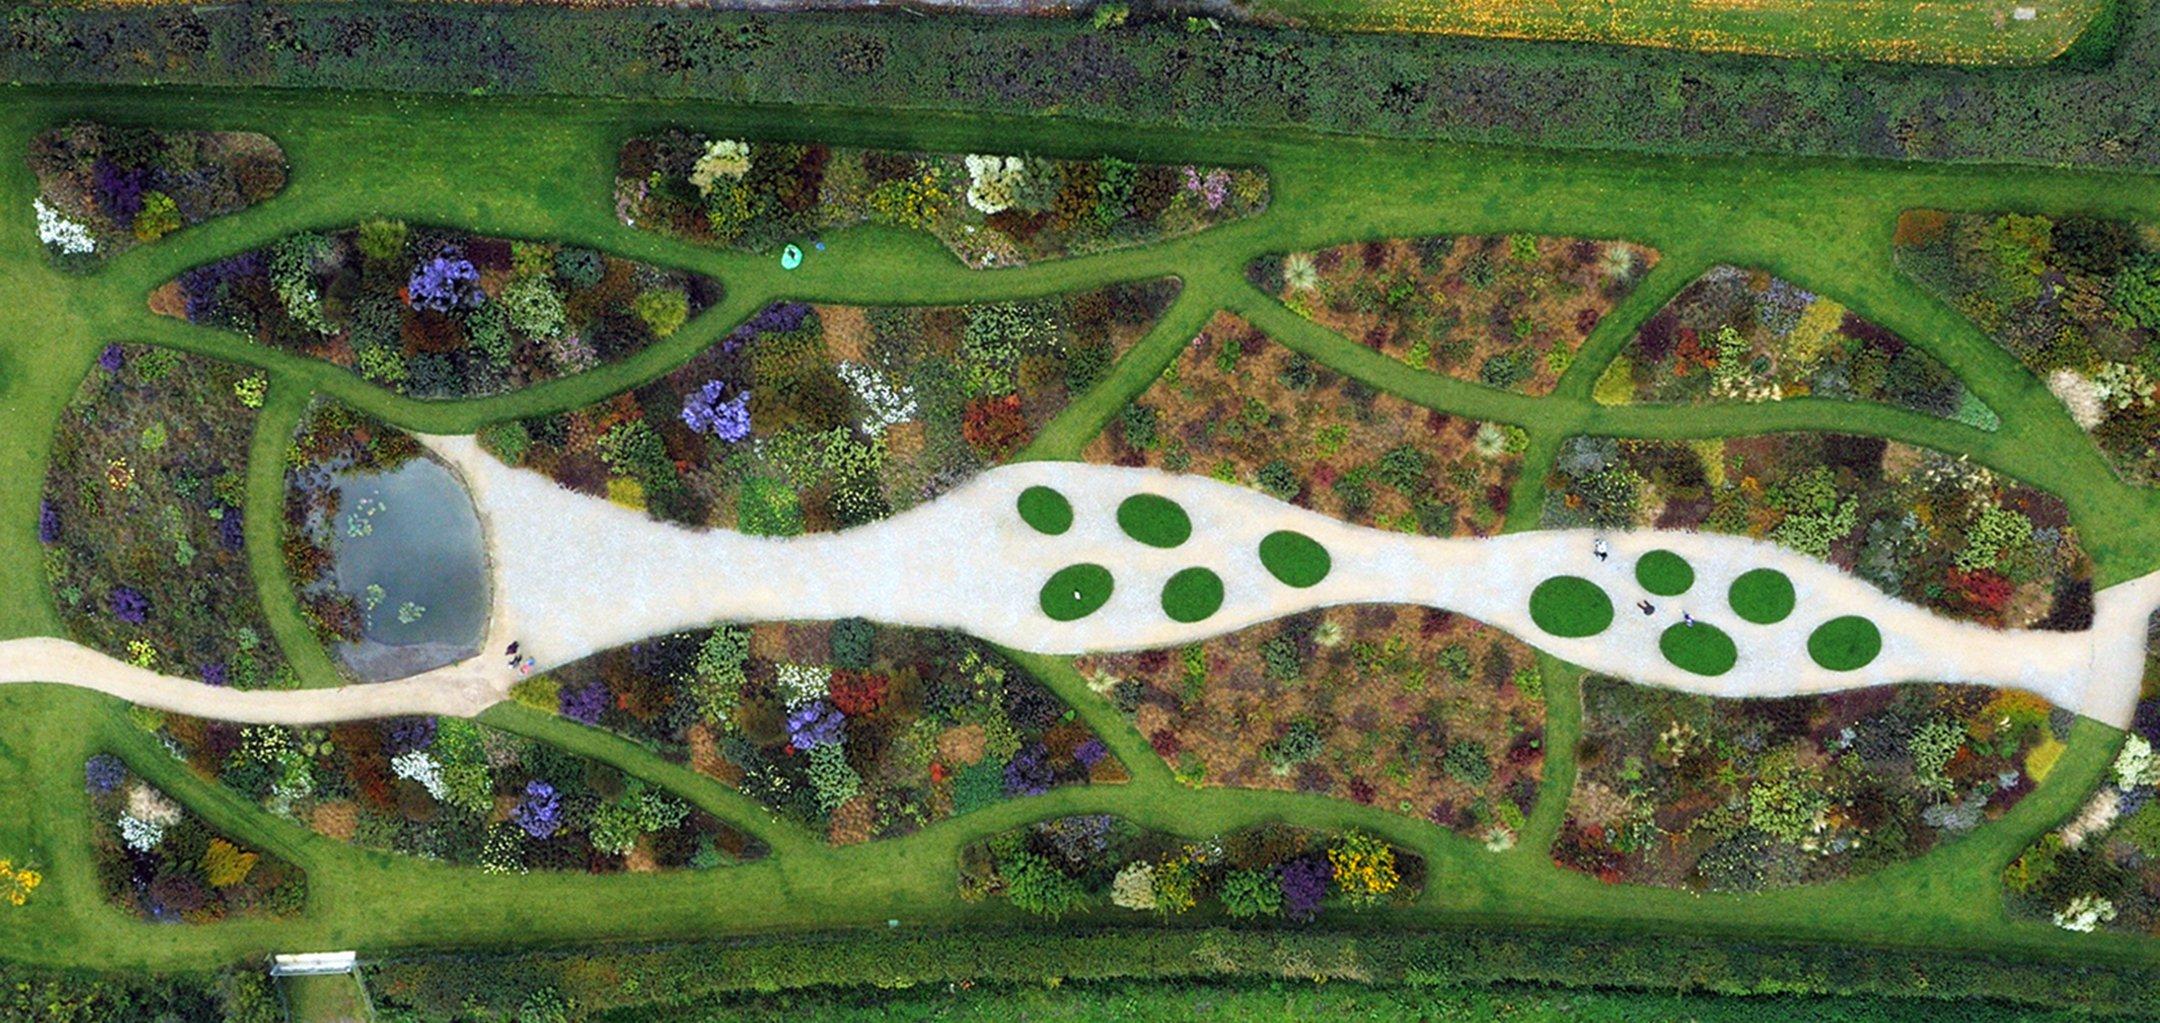 Overhead shot of ornate garden from 'Five Seasons- The Gardens of Piet Oudolf' (2017)